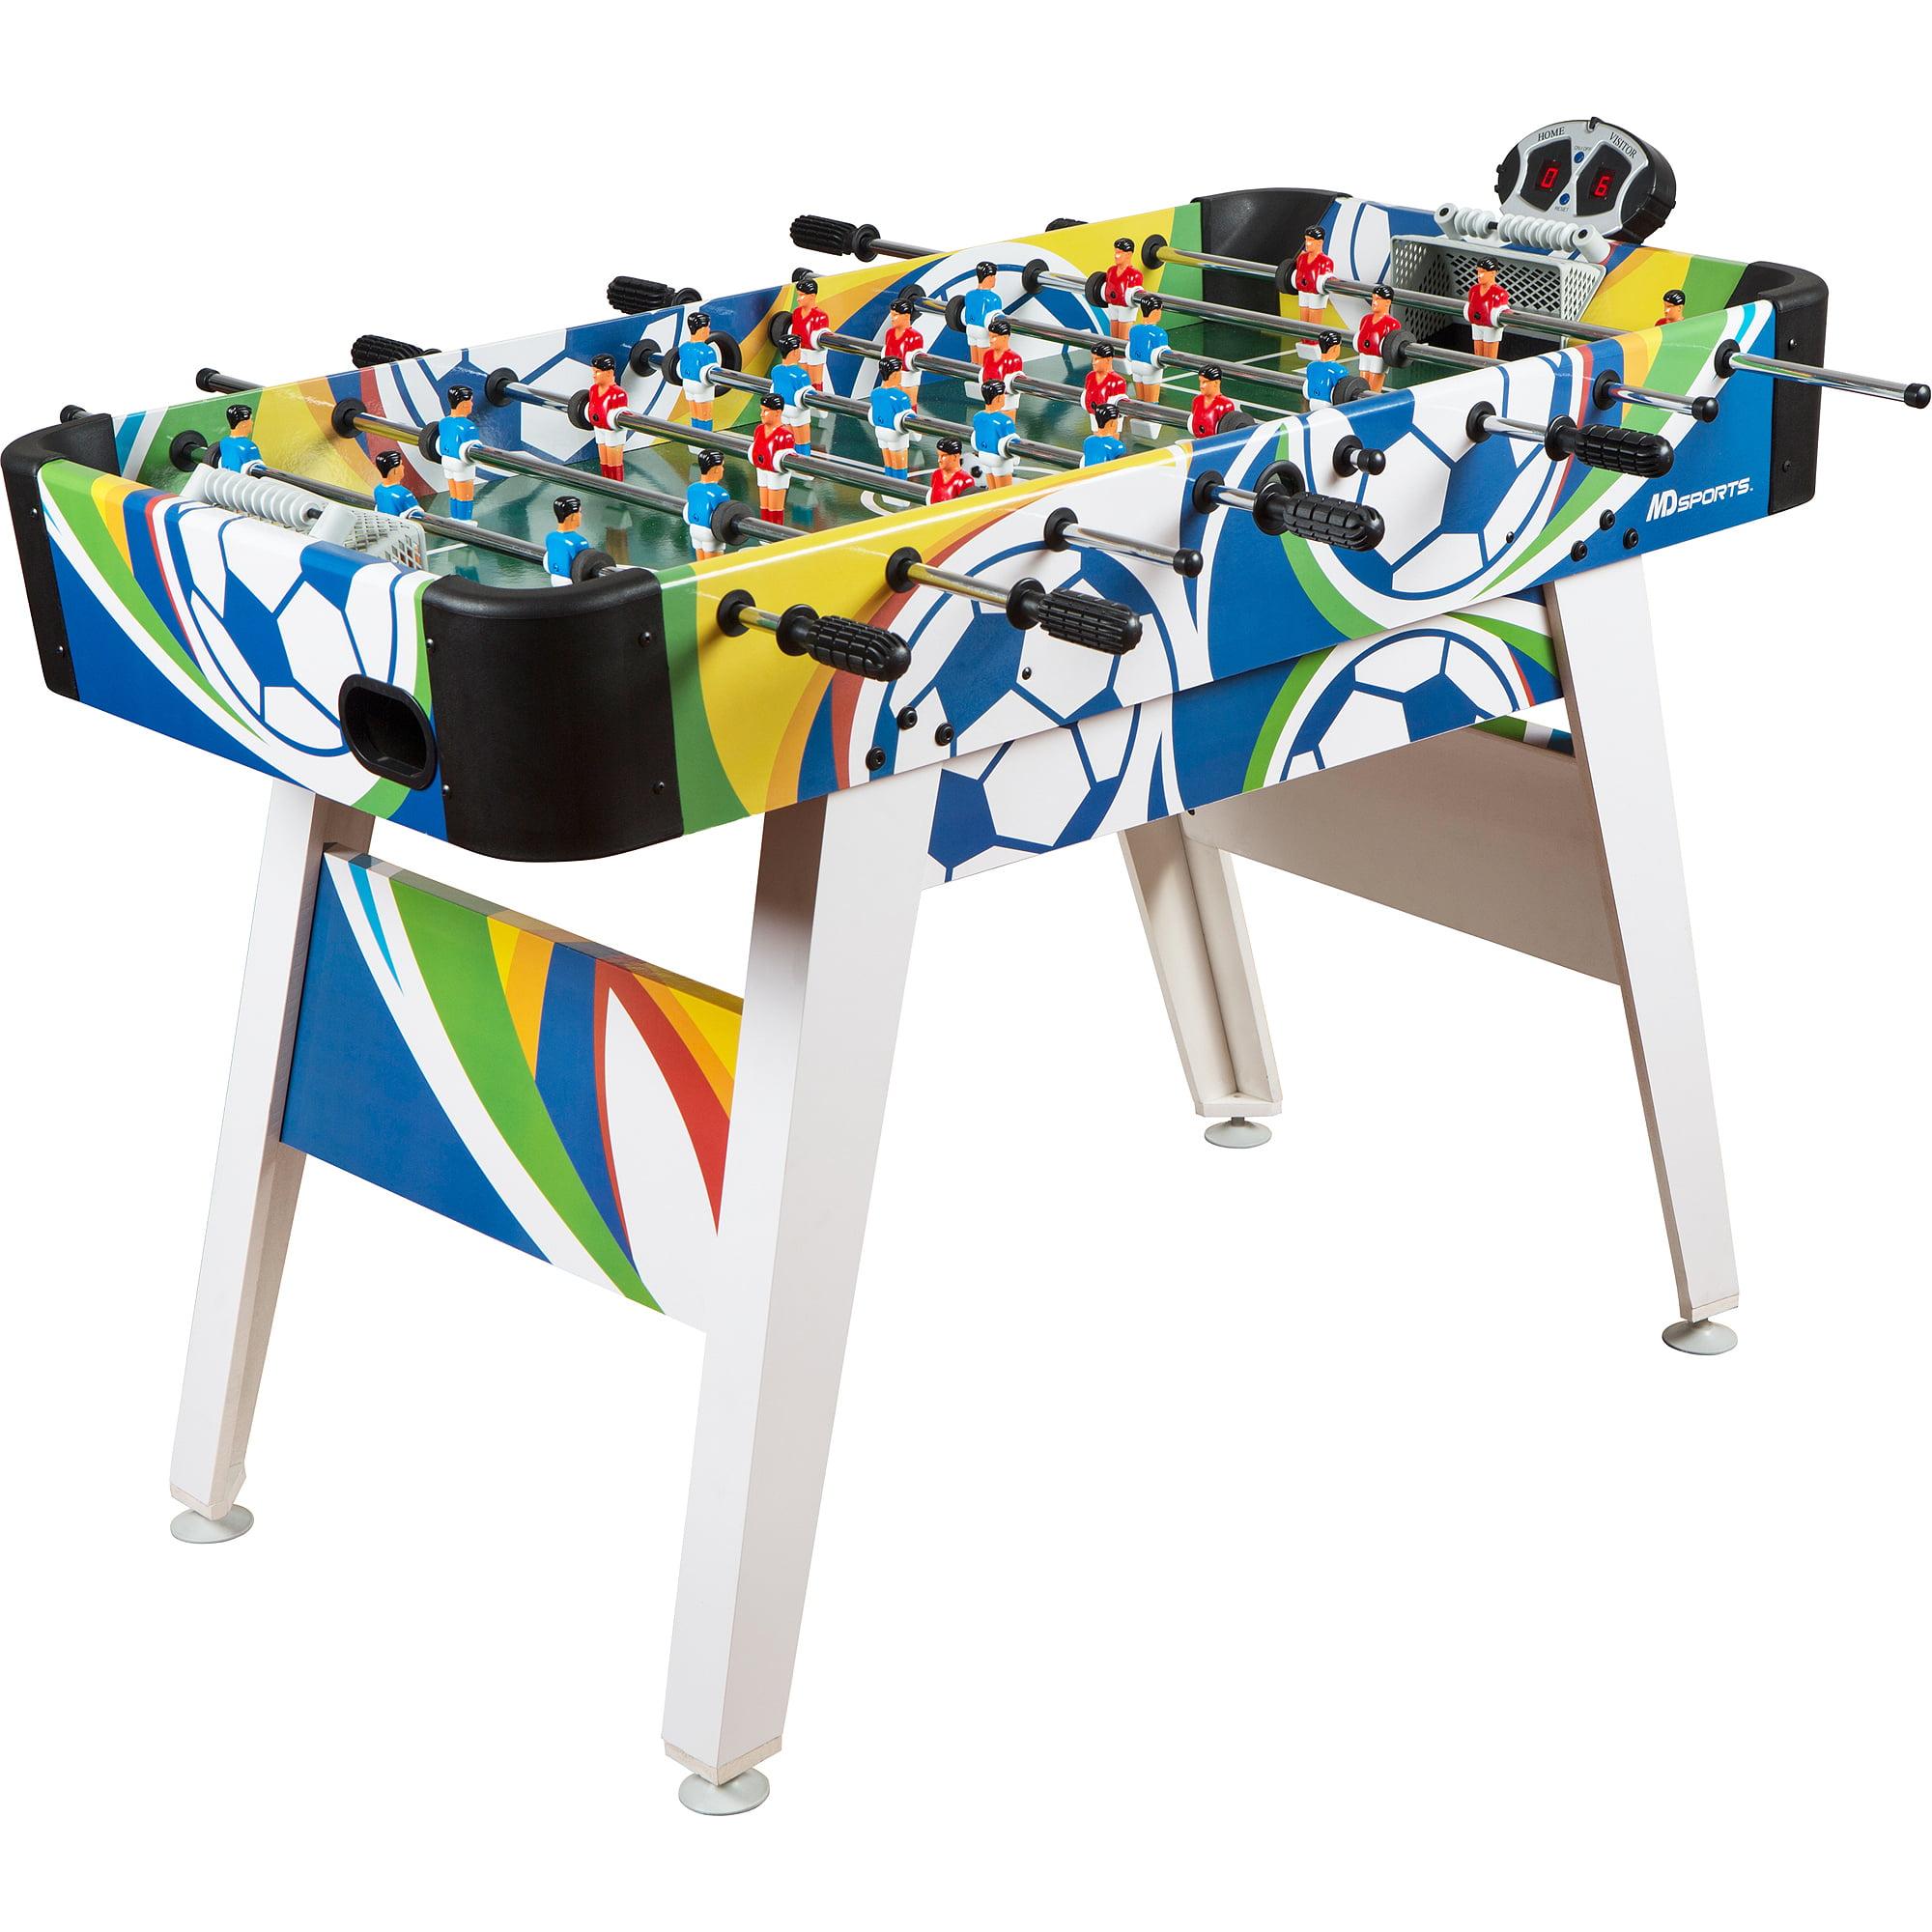 Soccer Game   Walmart.com